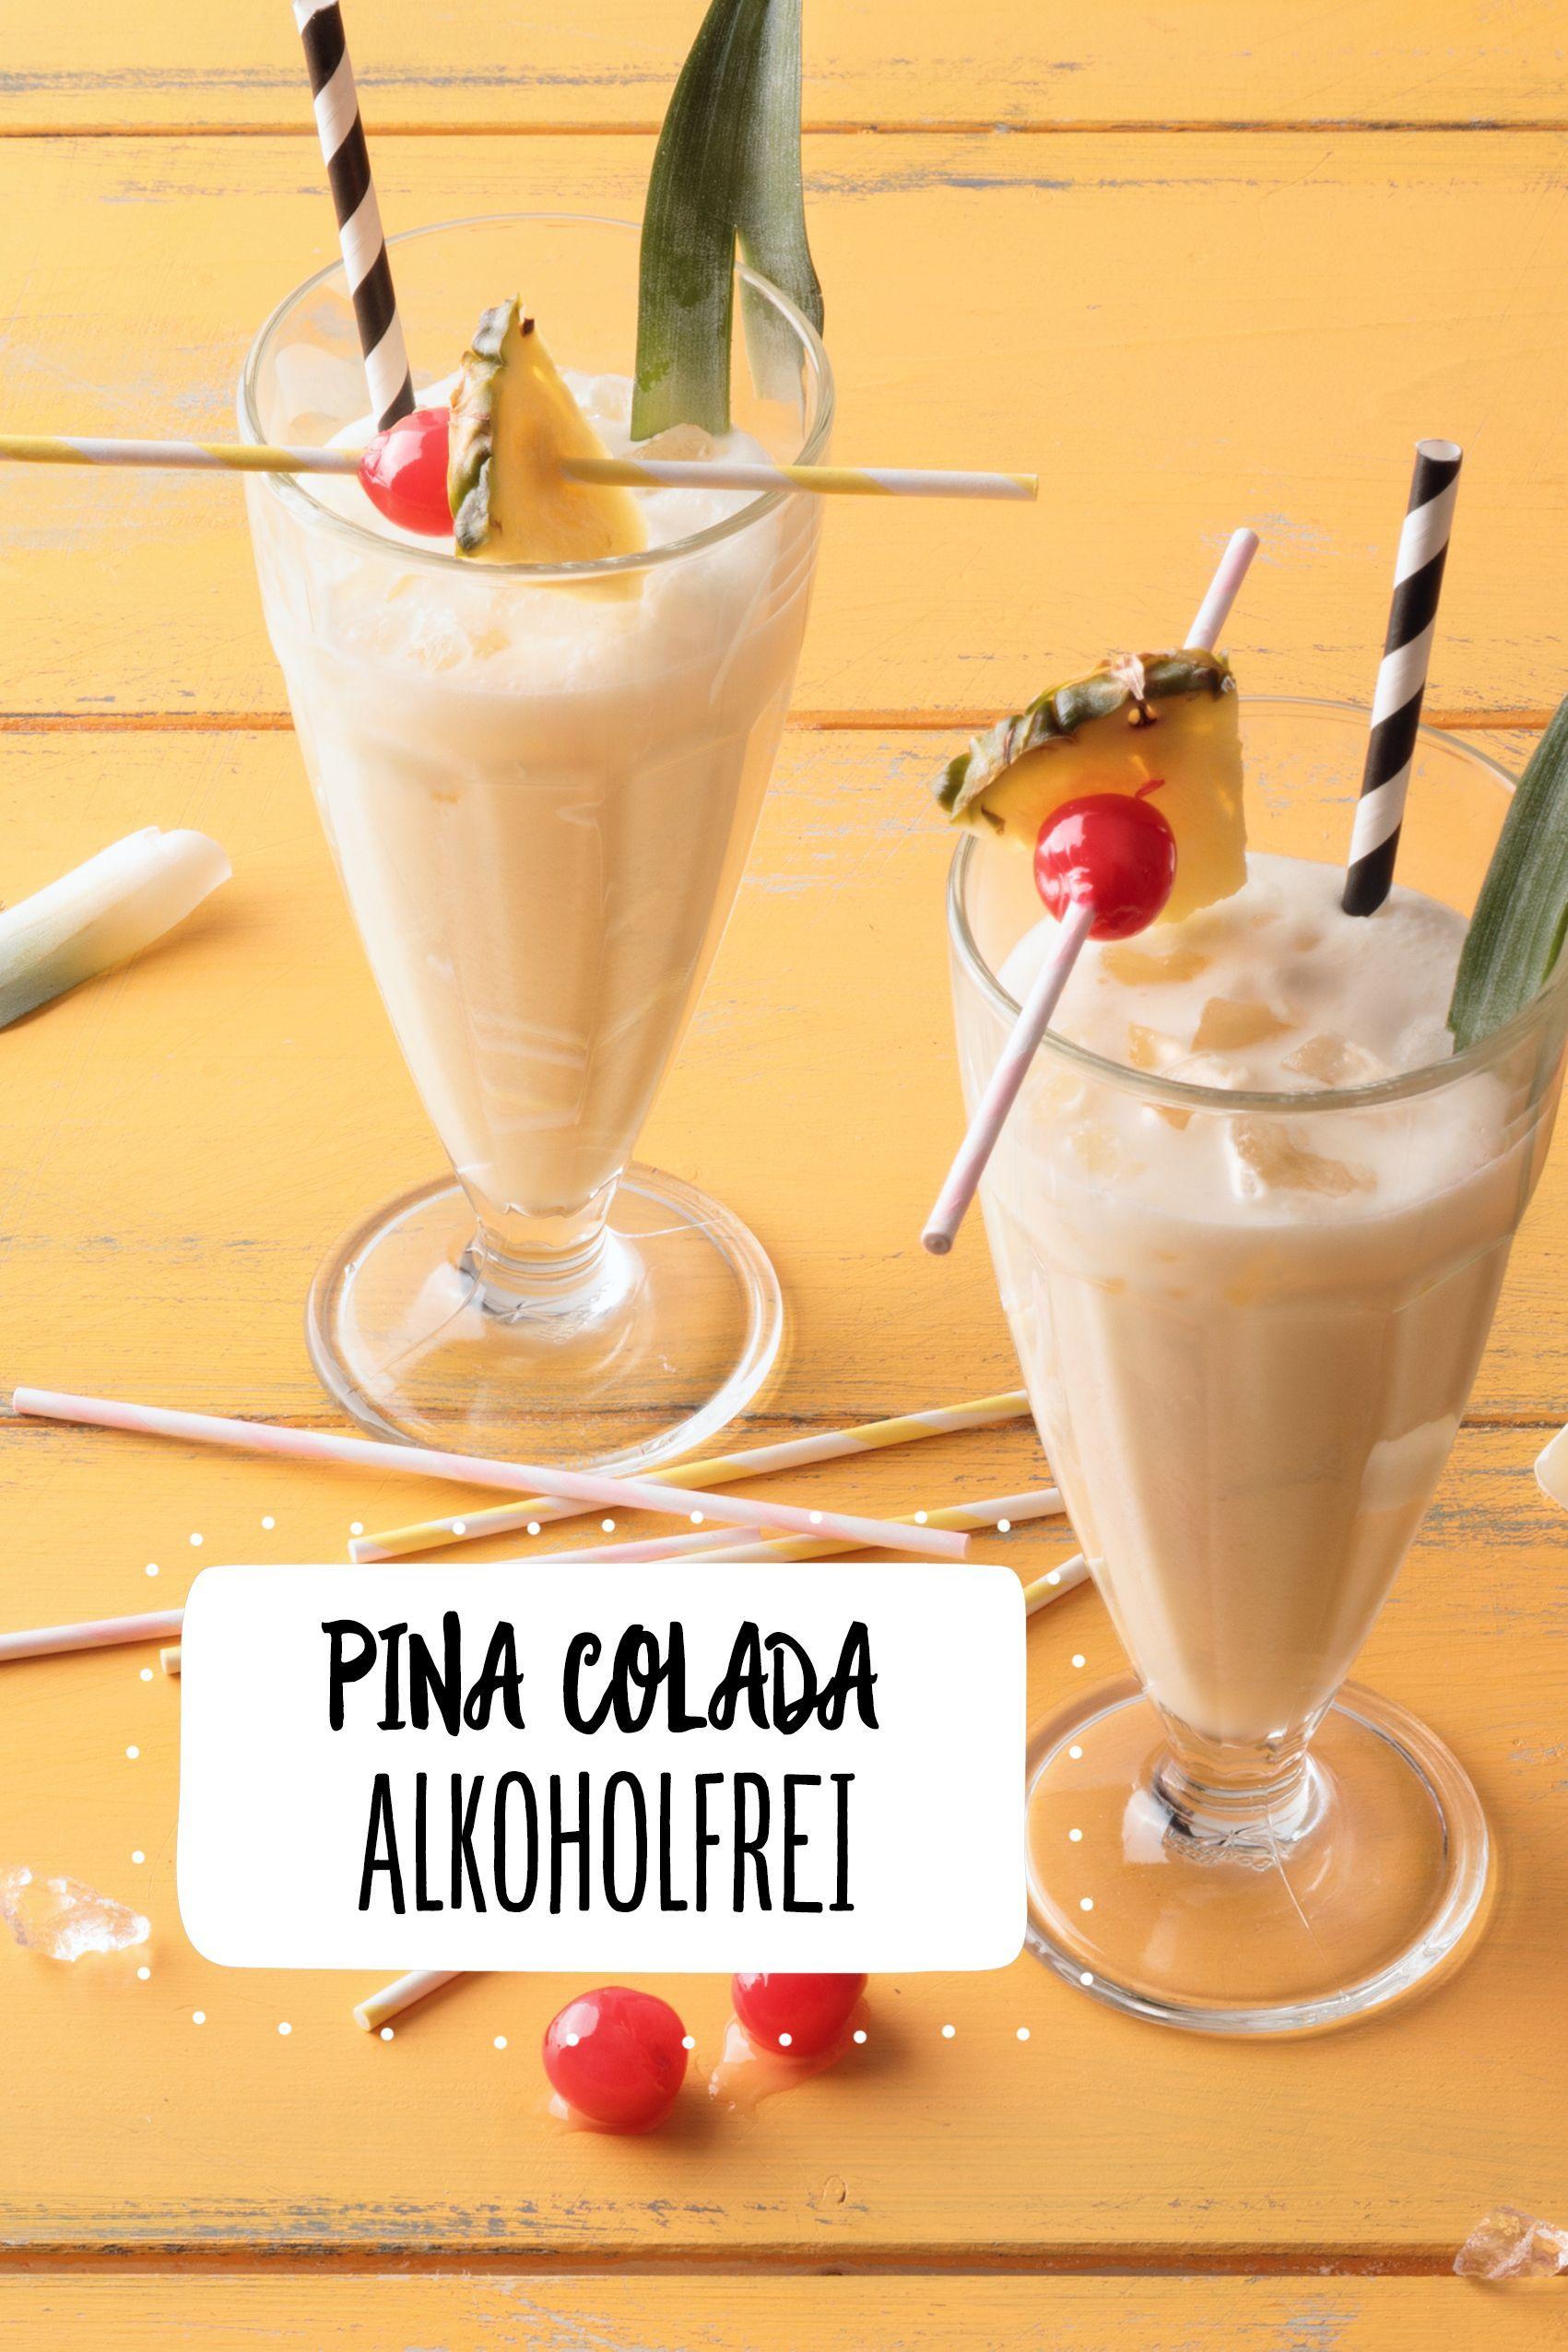 Alkoholfreie Pina Colada Summeralcoholicdrinks Alkoholfreie Pina Colada Mocktail Pinacolada Alkoholfrei Dr Pina Colada Alkoholfrei Pina Colada Alkoholfrei